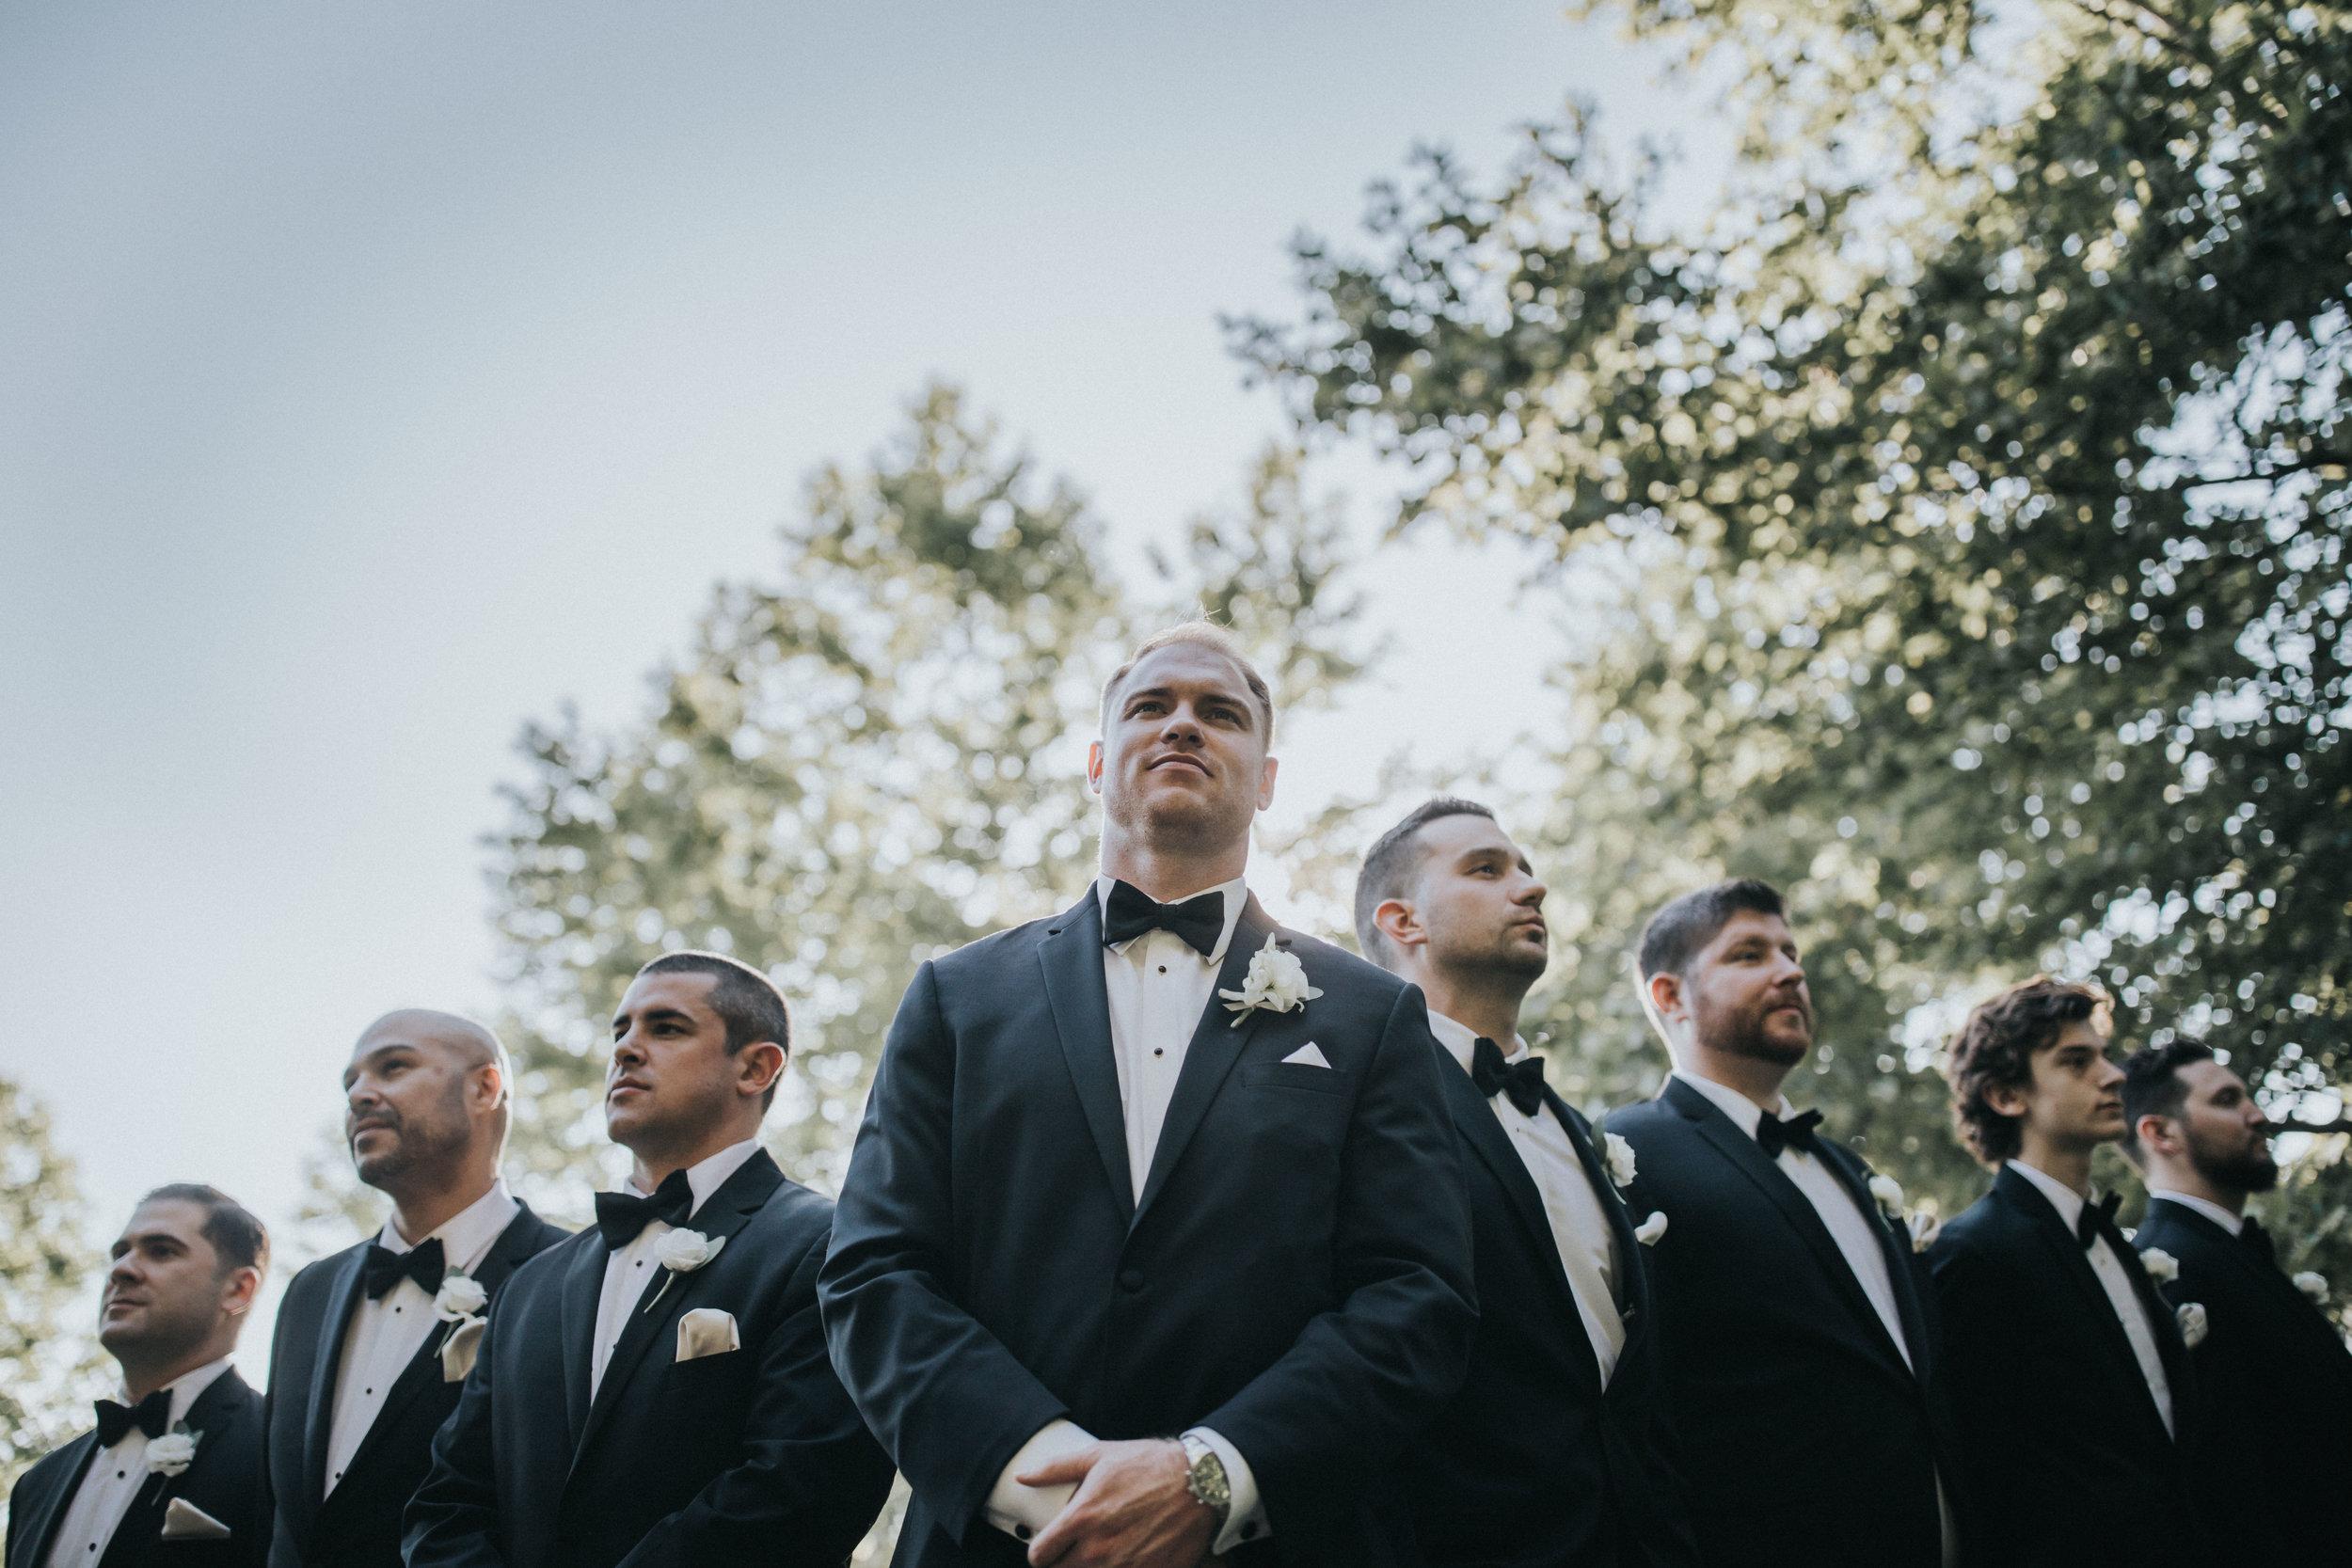 NewJersey_Wedding_Photography_Philadelphia__cescaphe_Waterworks_BridalParty-50.jpg